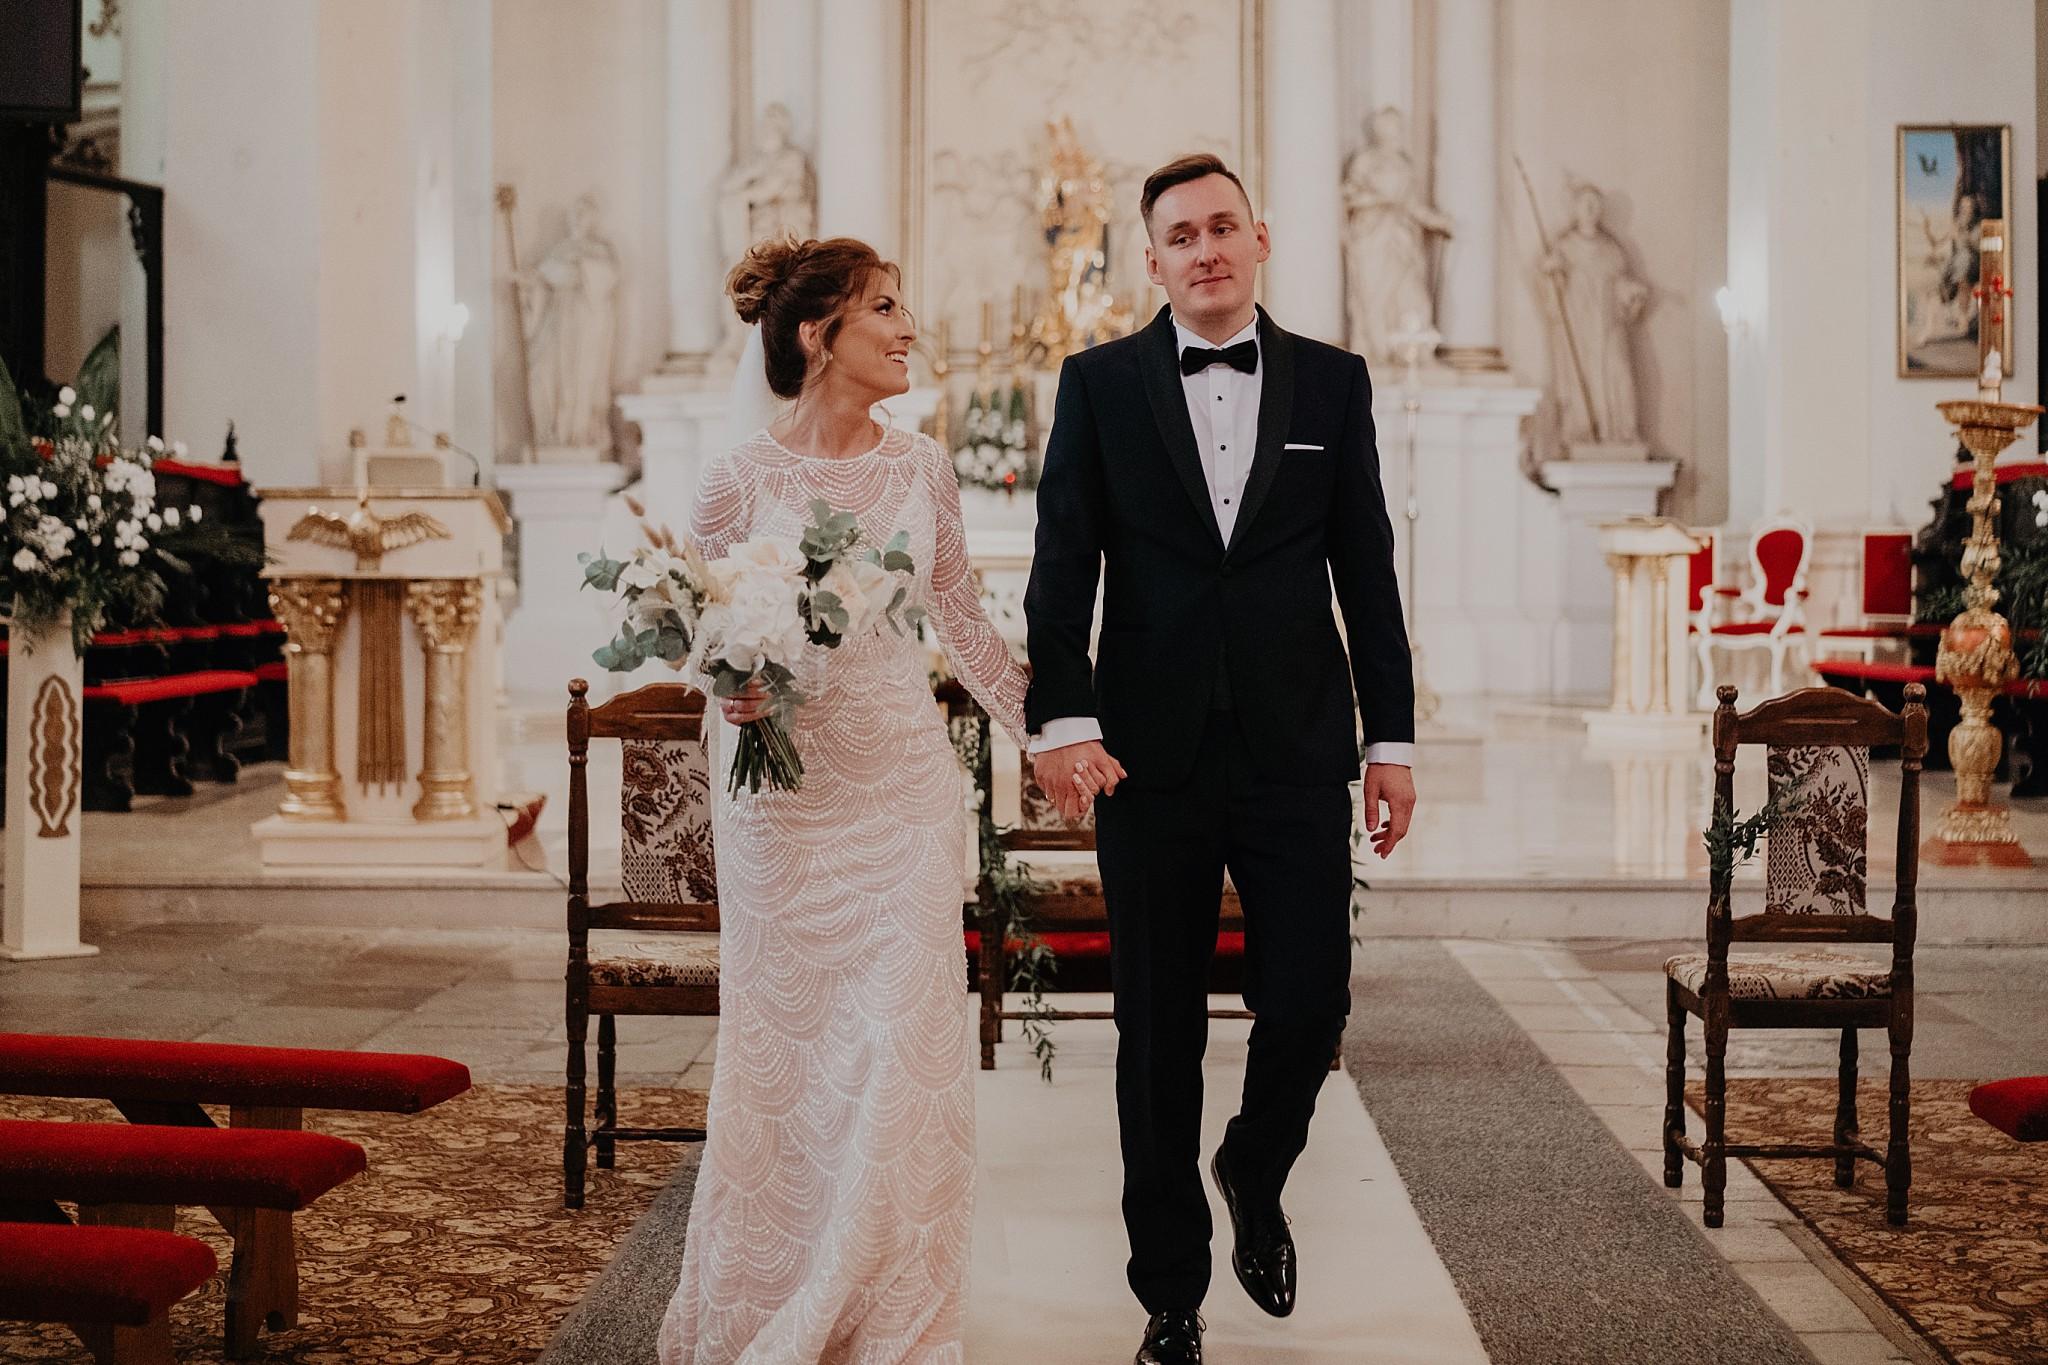 fotograf poznan wesele dobra truskawka piekne wesele pod poznaniem wesele w dobrej truskawce piekna para mloda slub marzen slub koronawirus slub listopad wesele koronawirus 209